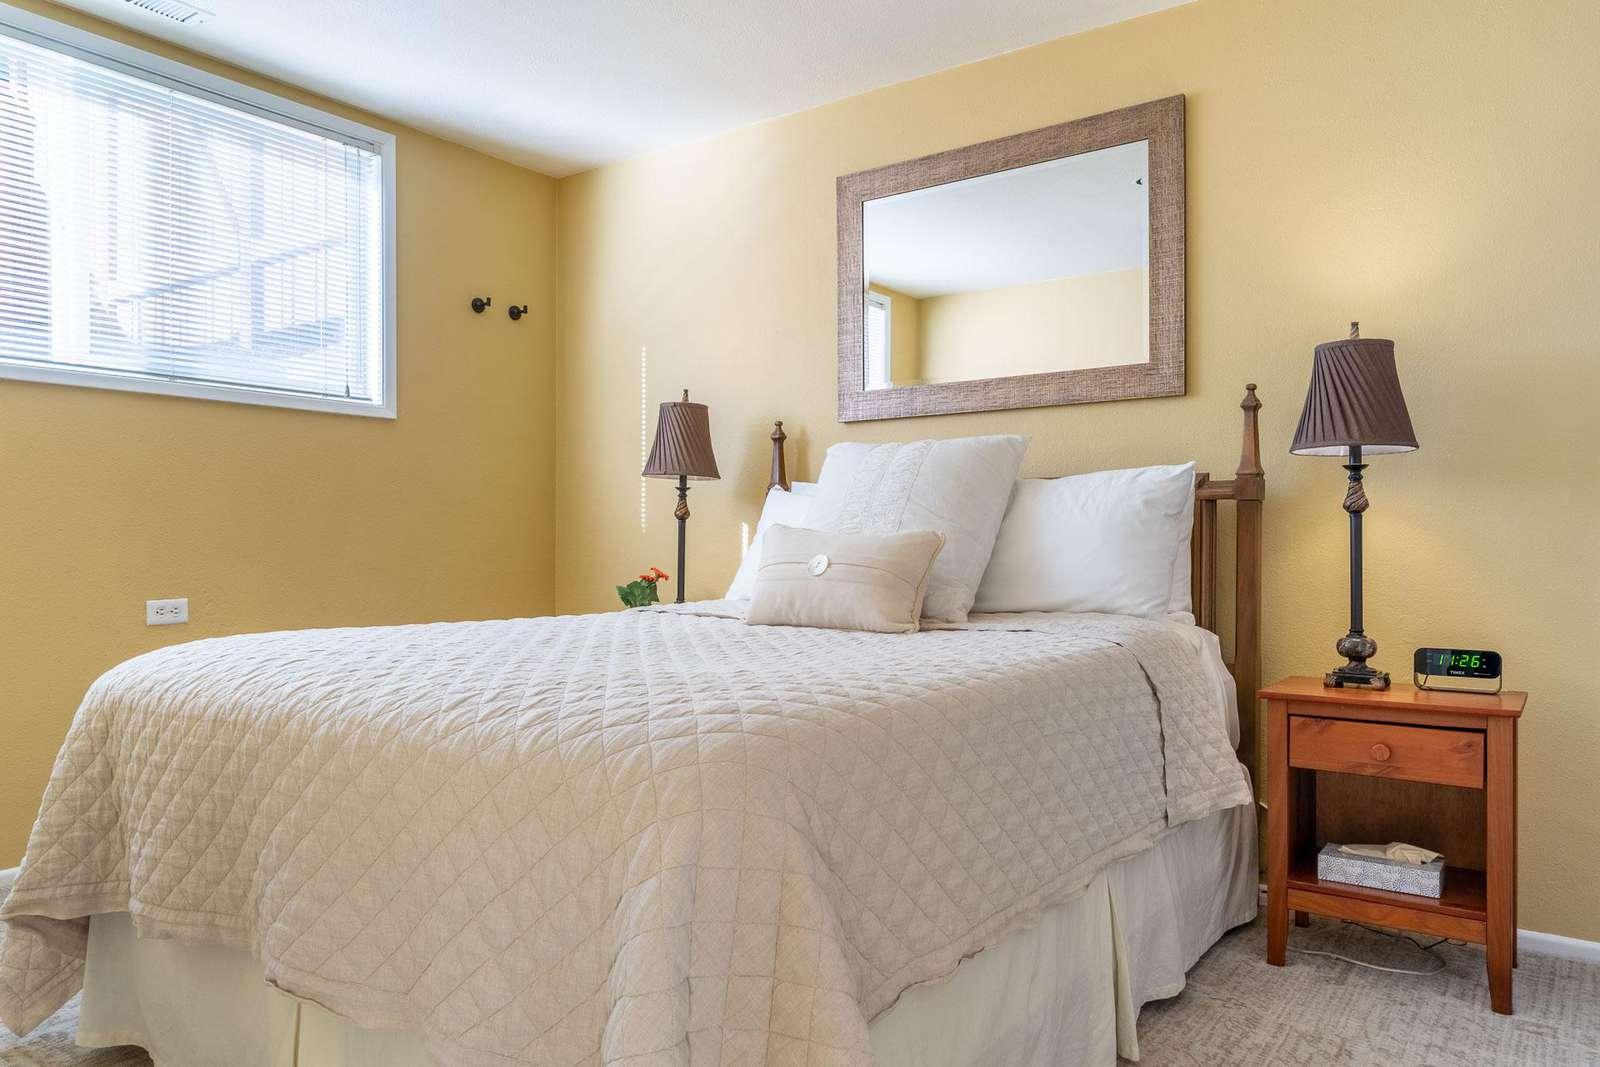 North Room - Queen pillow top bed - Summer linens